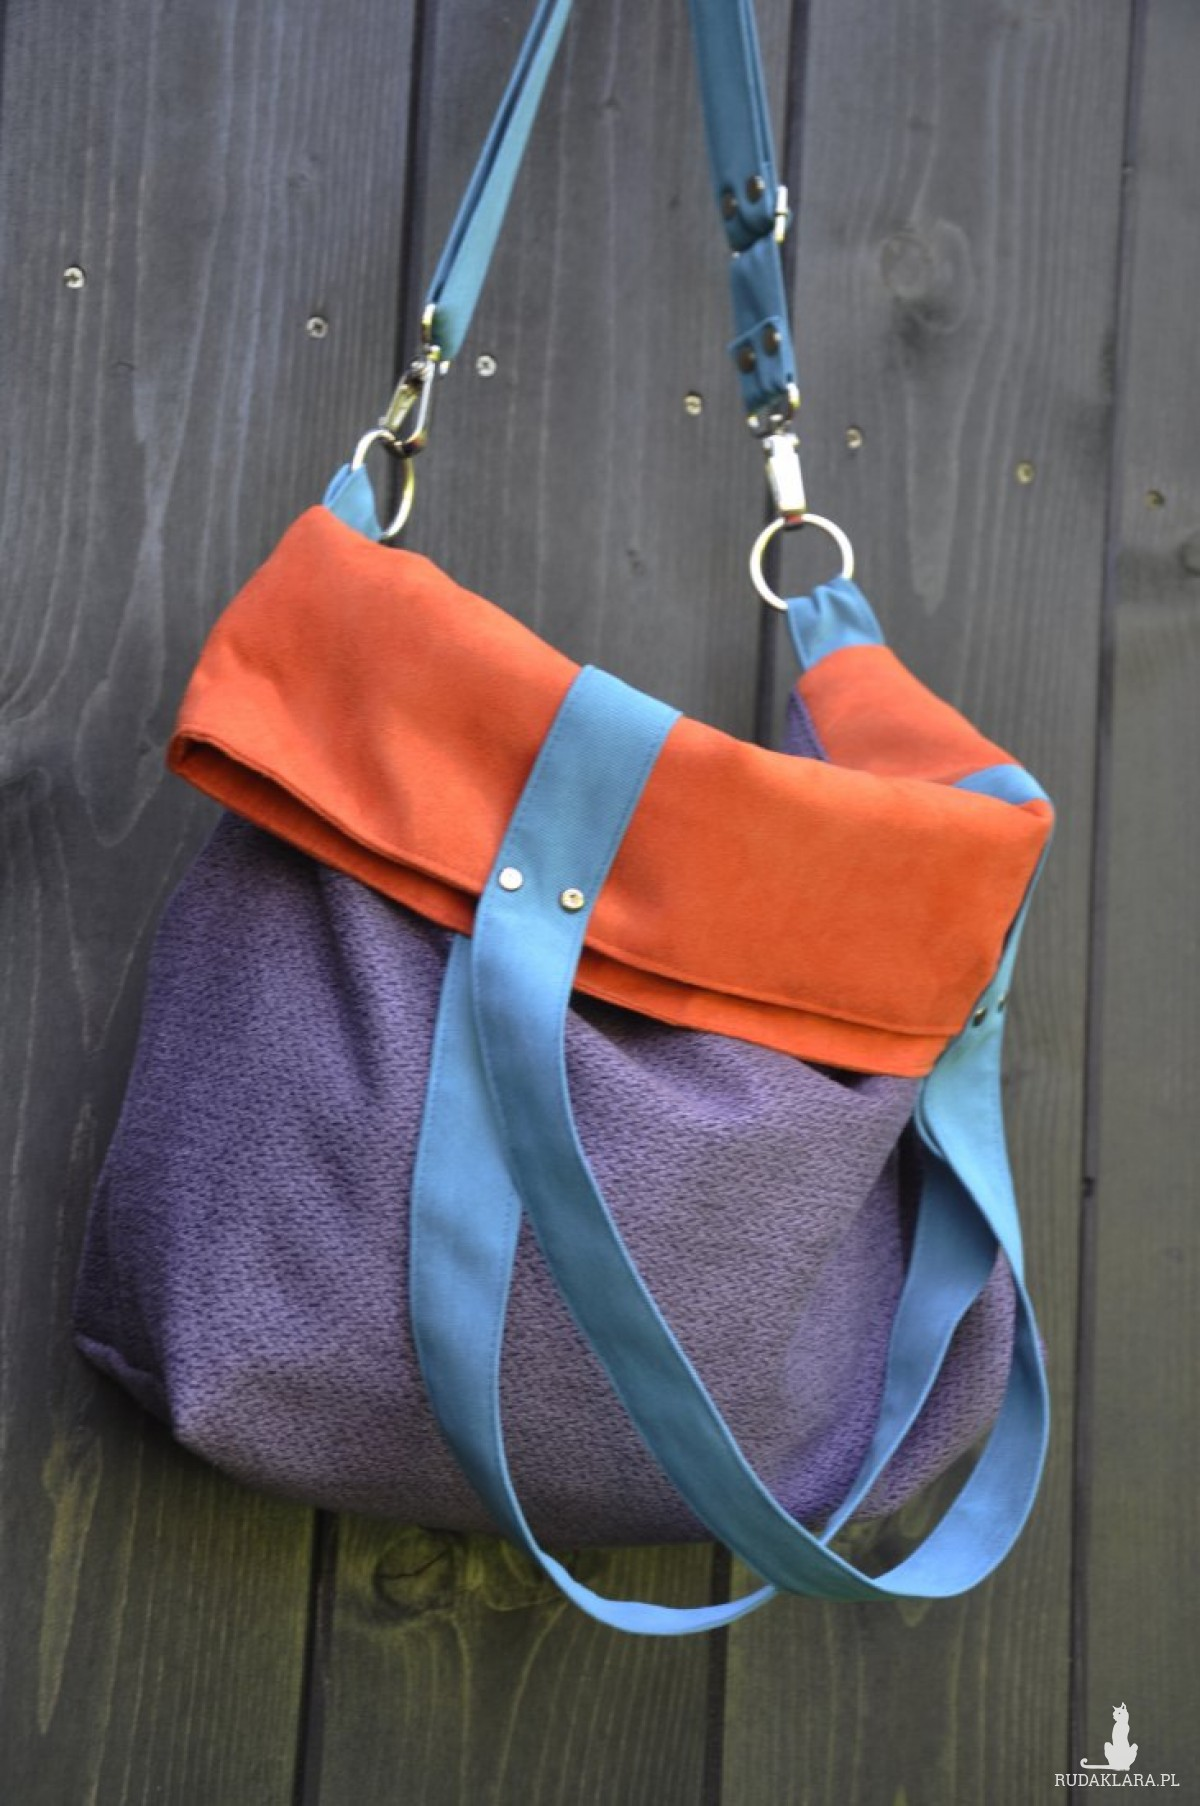 Torba na ramię - color block - fiolet, pomarańcz, turkus